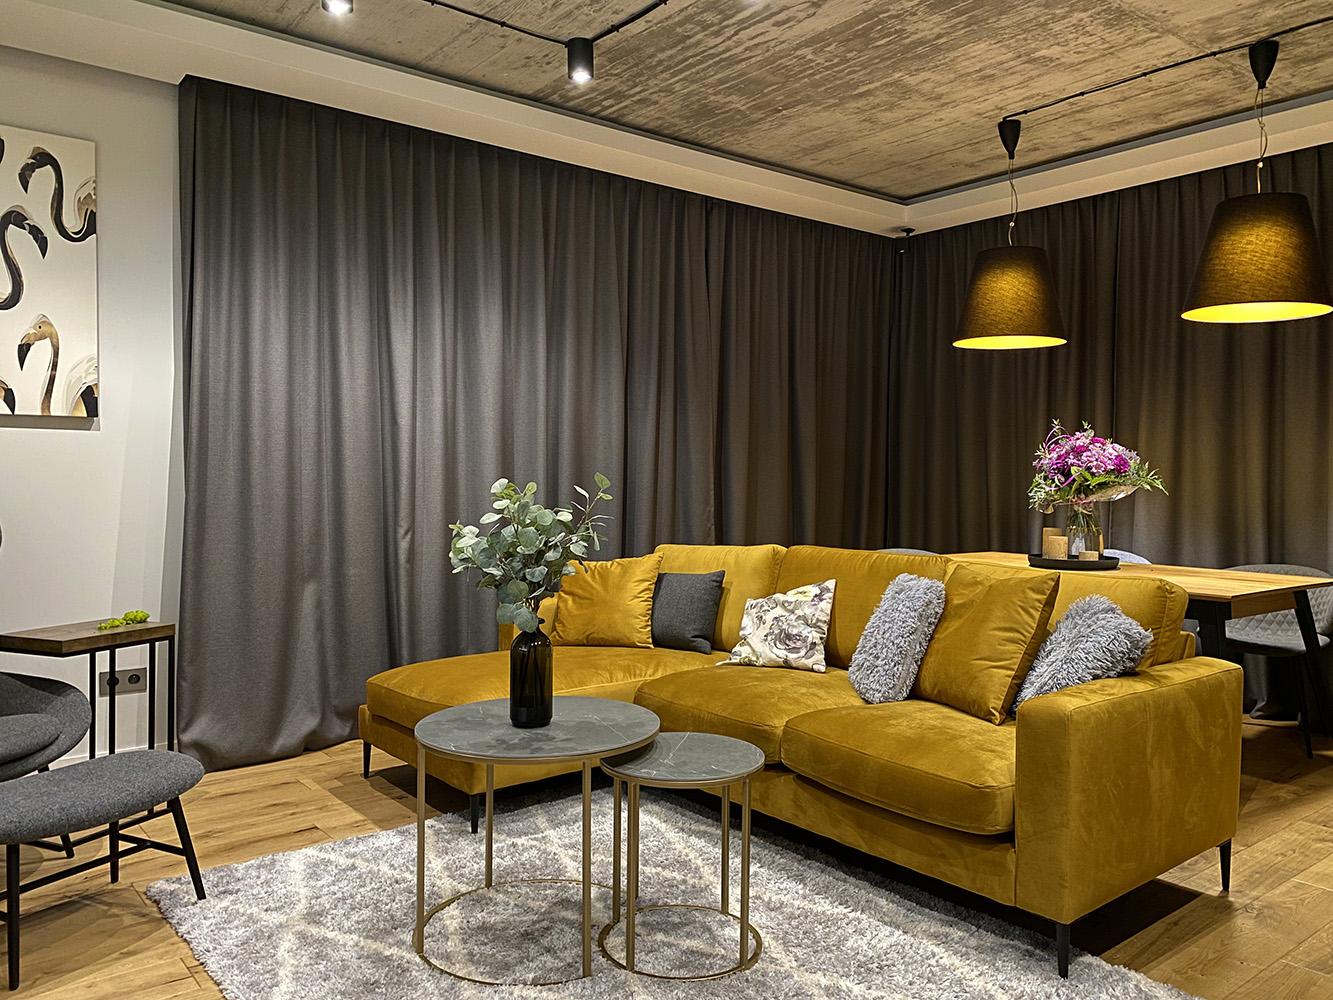 Covex mustard corner sofa from @flamingos.home